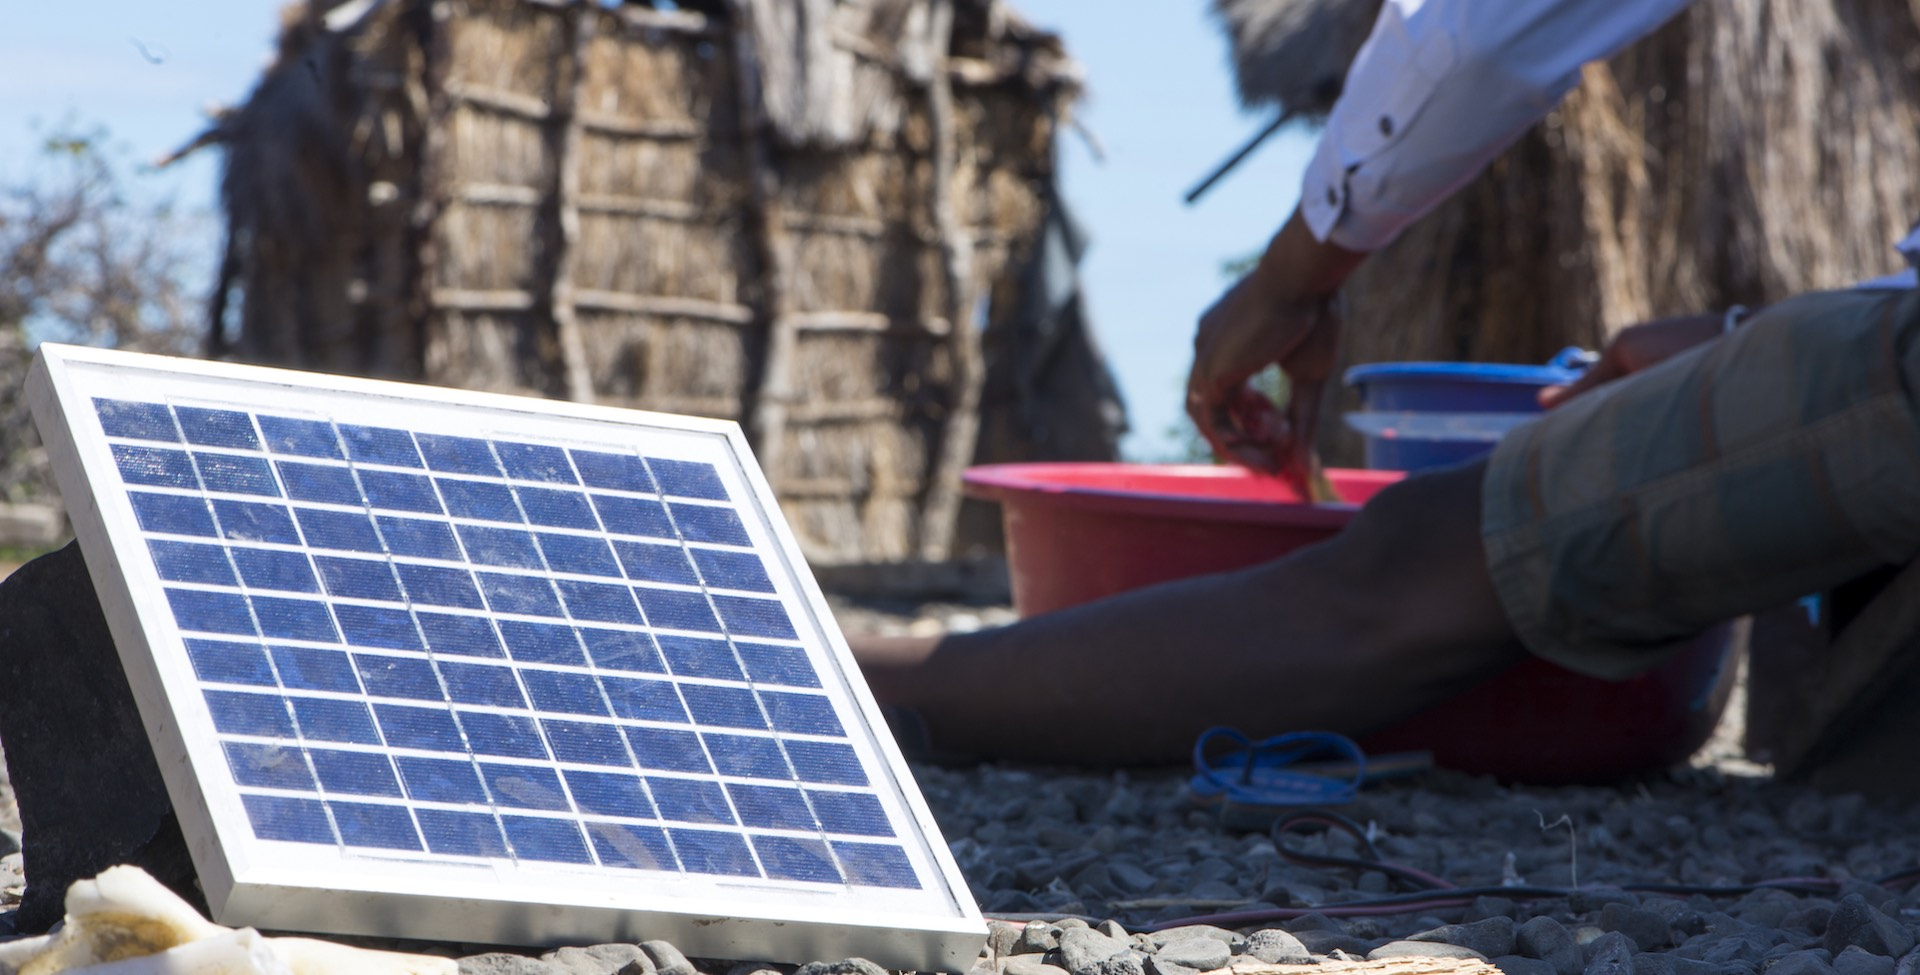 Solarmodul in afrikanischem Dorf